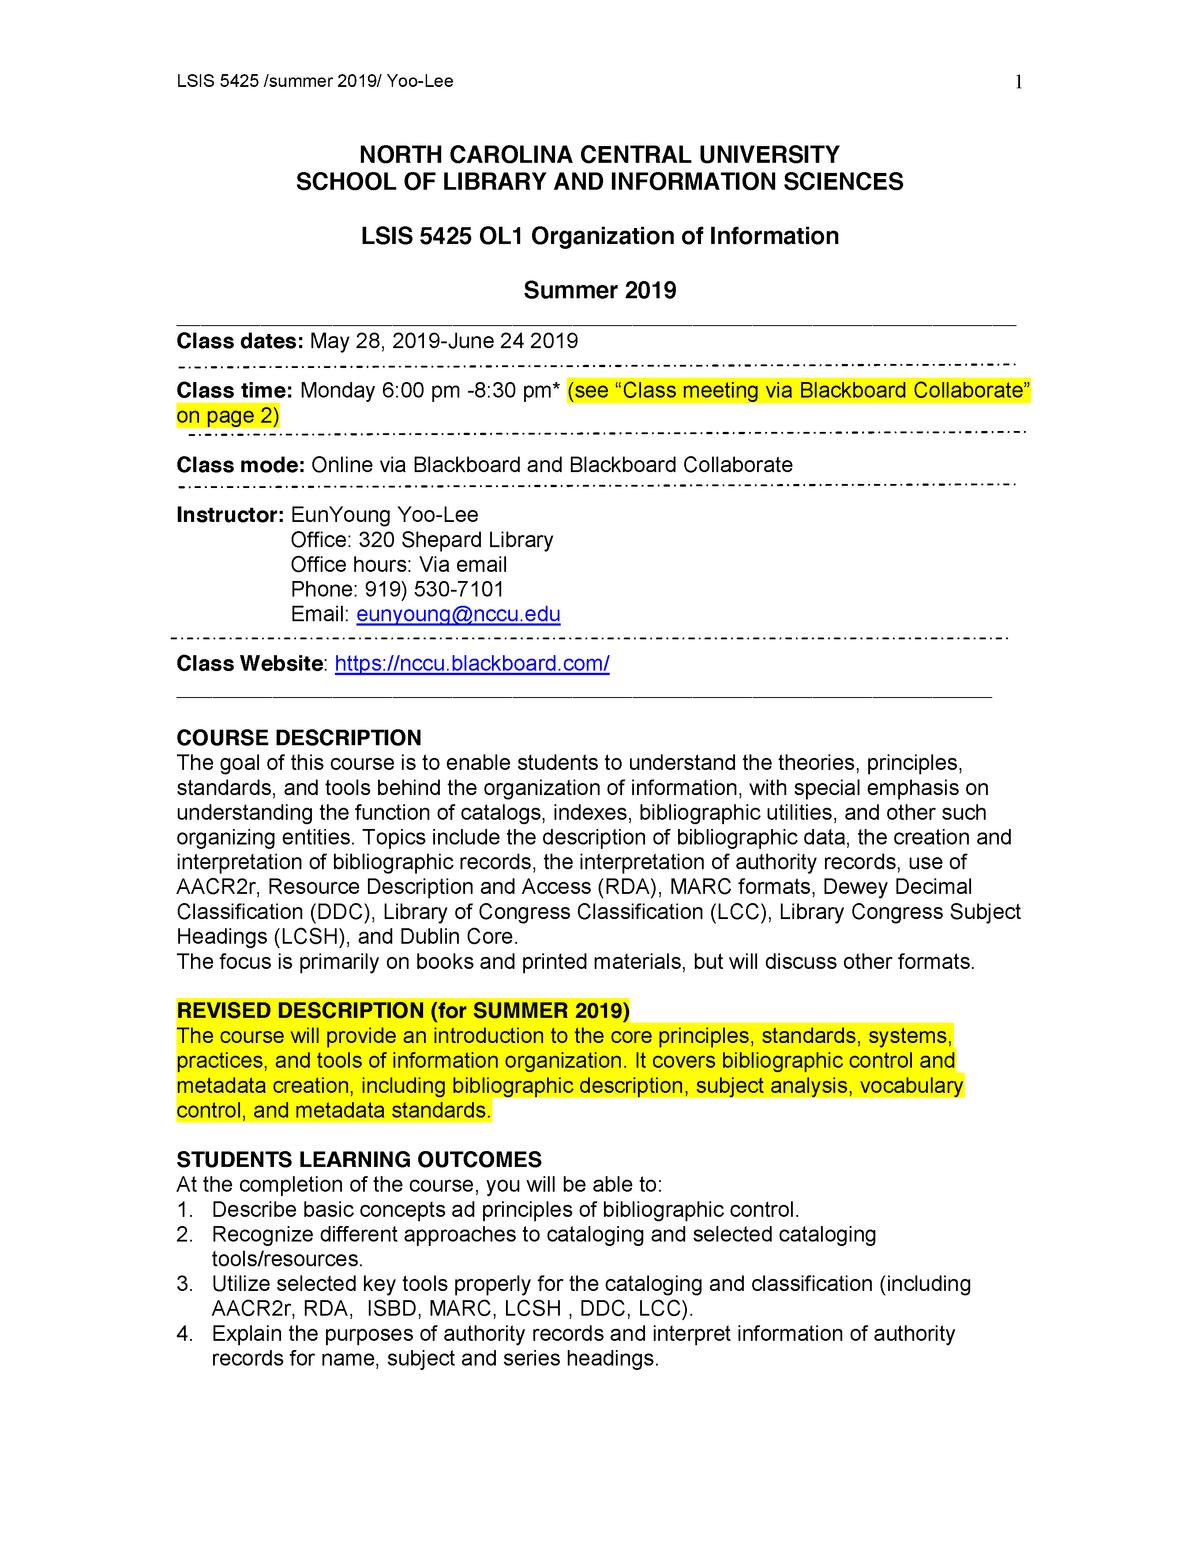 LSIS 5423 Syllabus Organization of Information Summer 2019